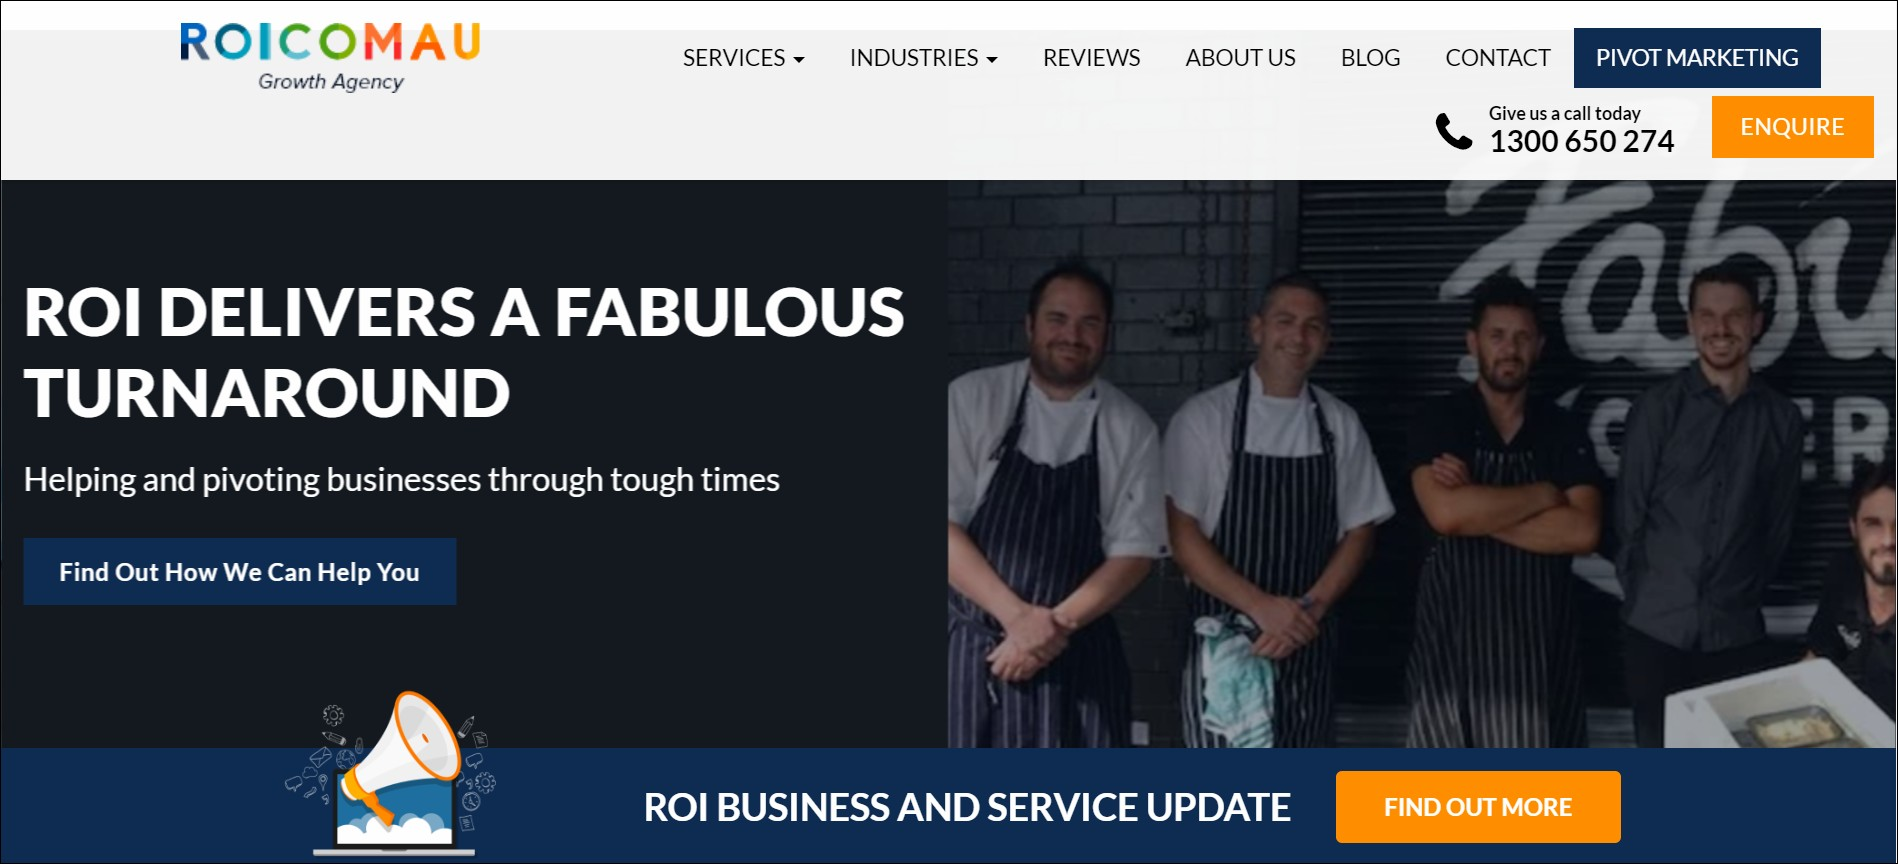 ROICOMAU: advertising agencies in Australia